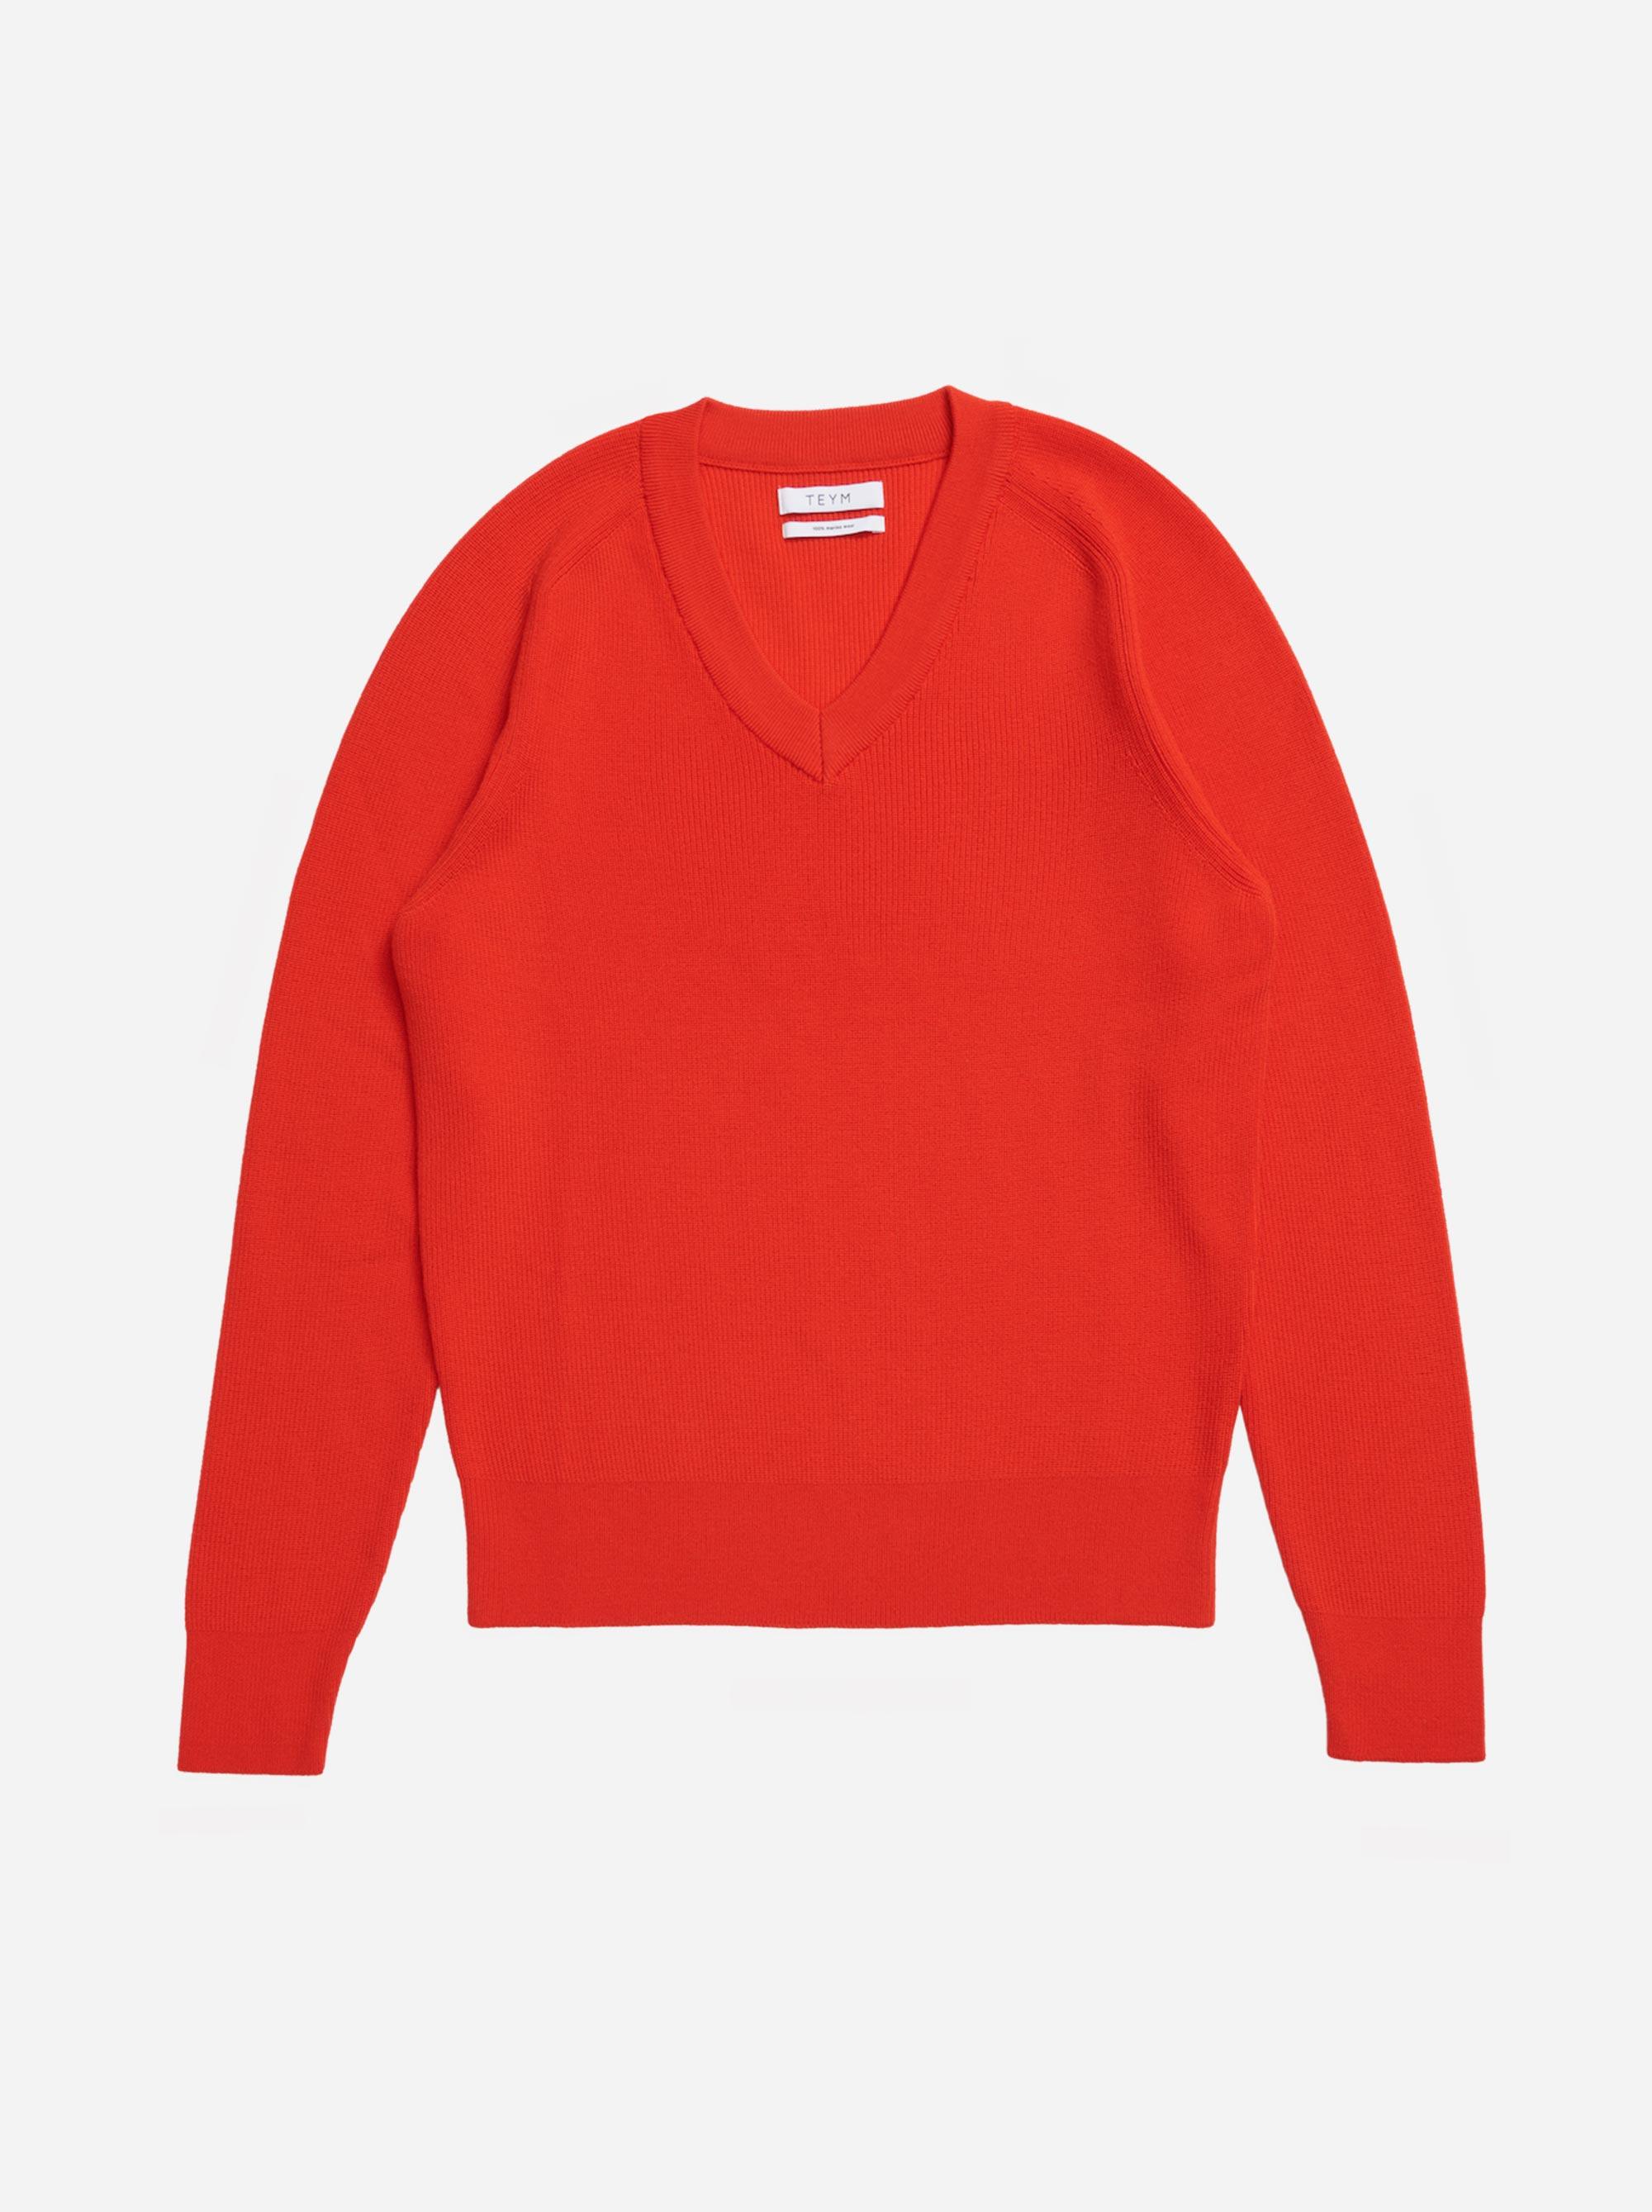 Teym - V-Neck - The Merino Sweater - Women - Red - 4